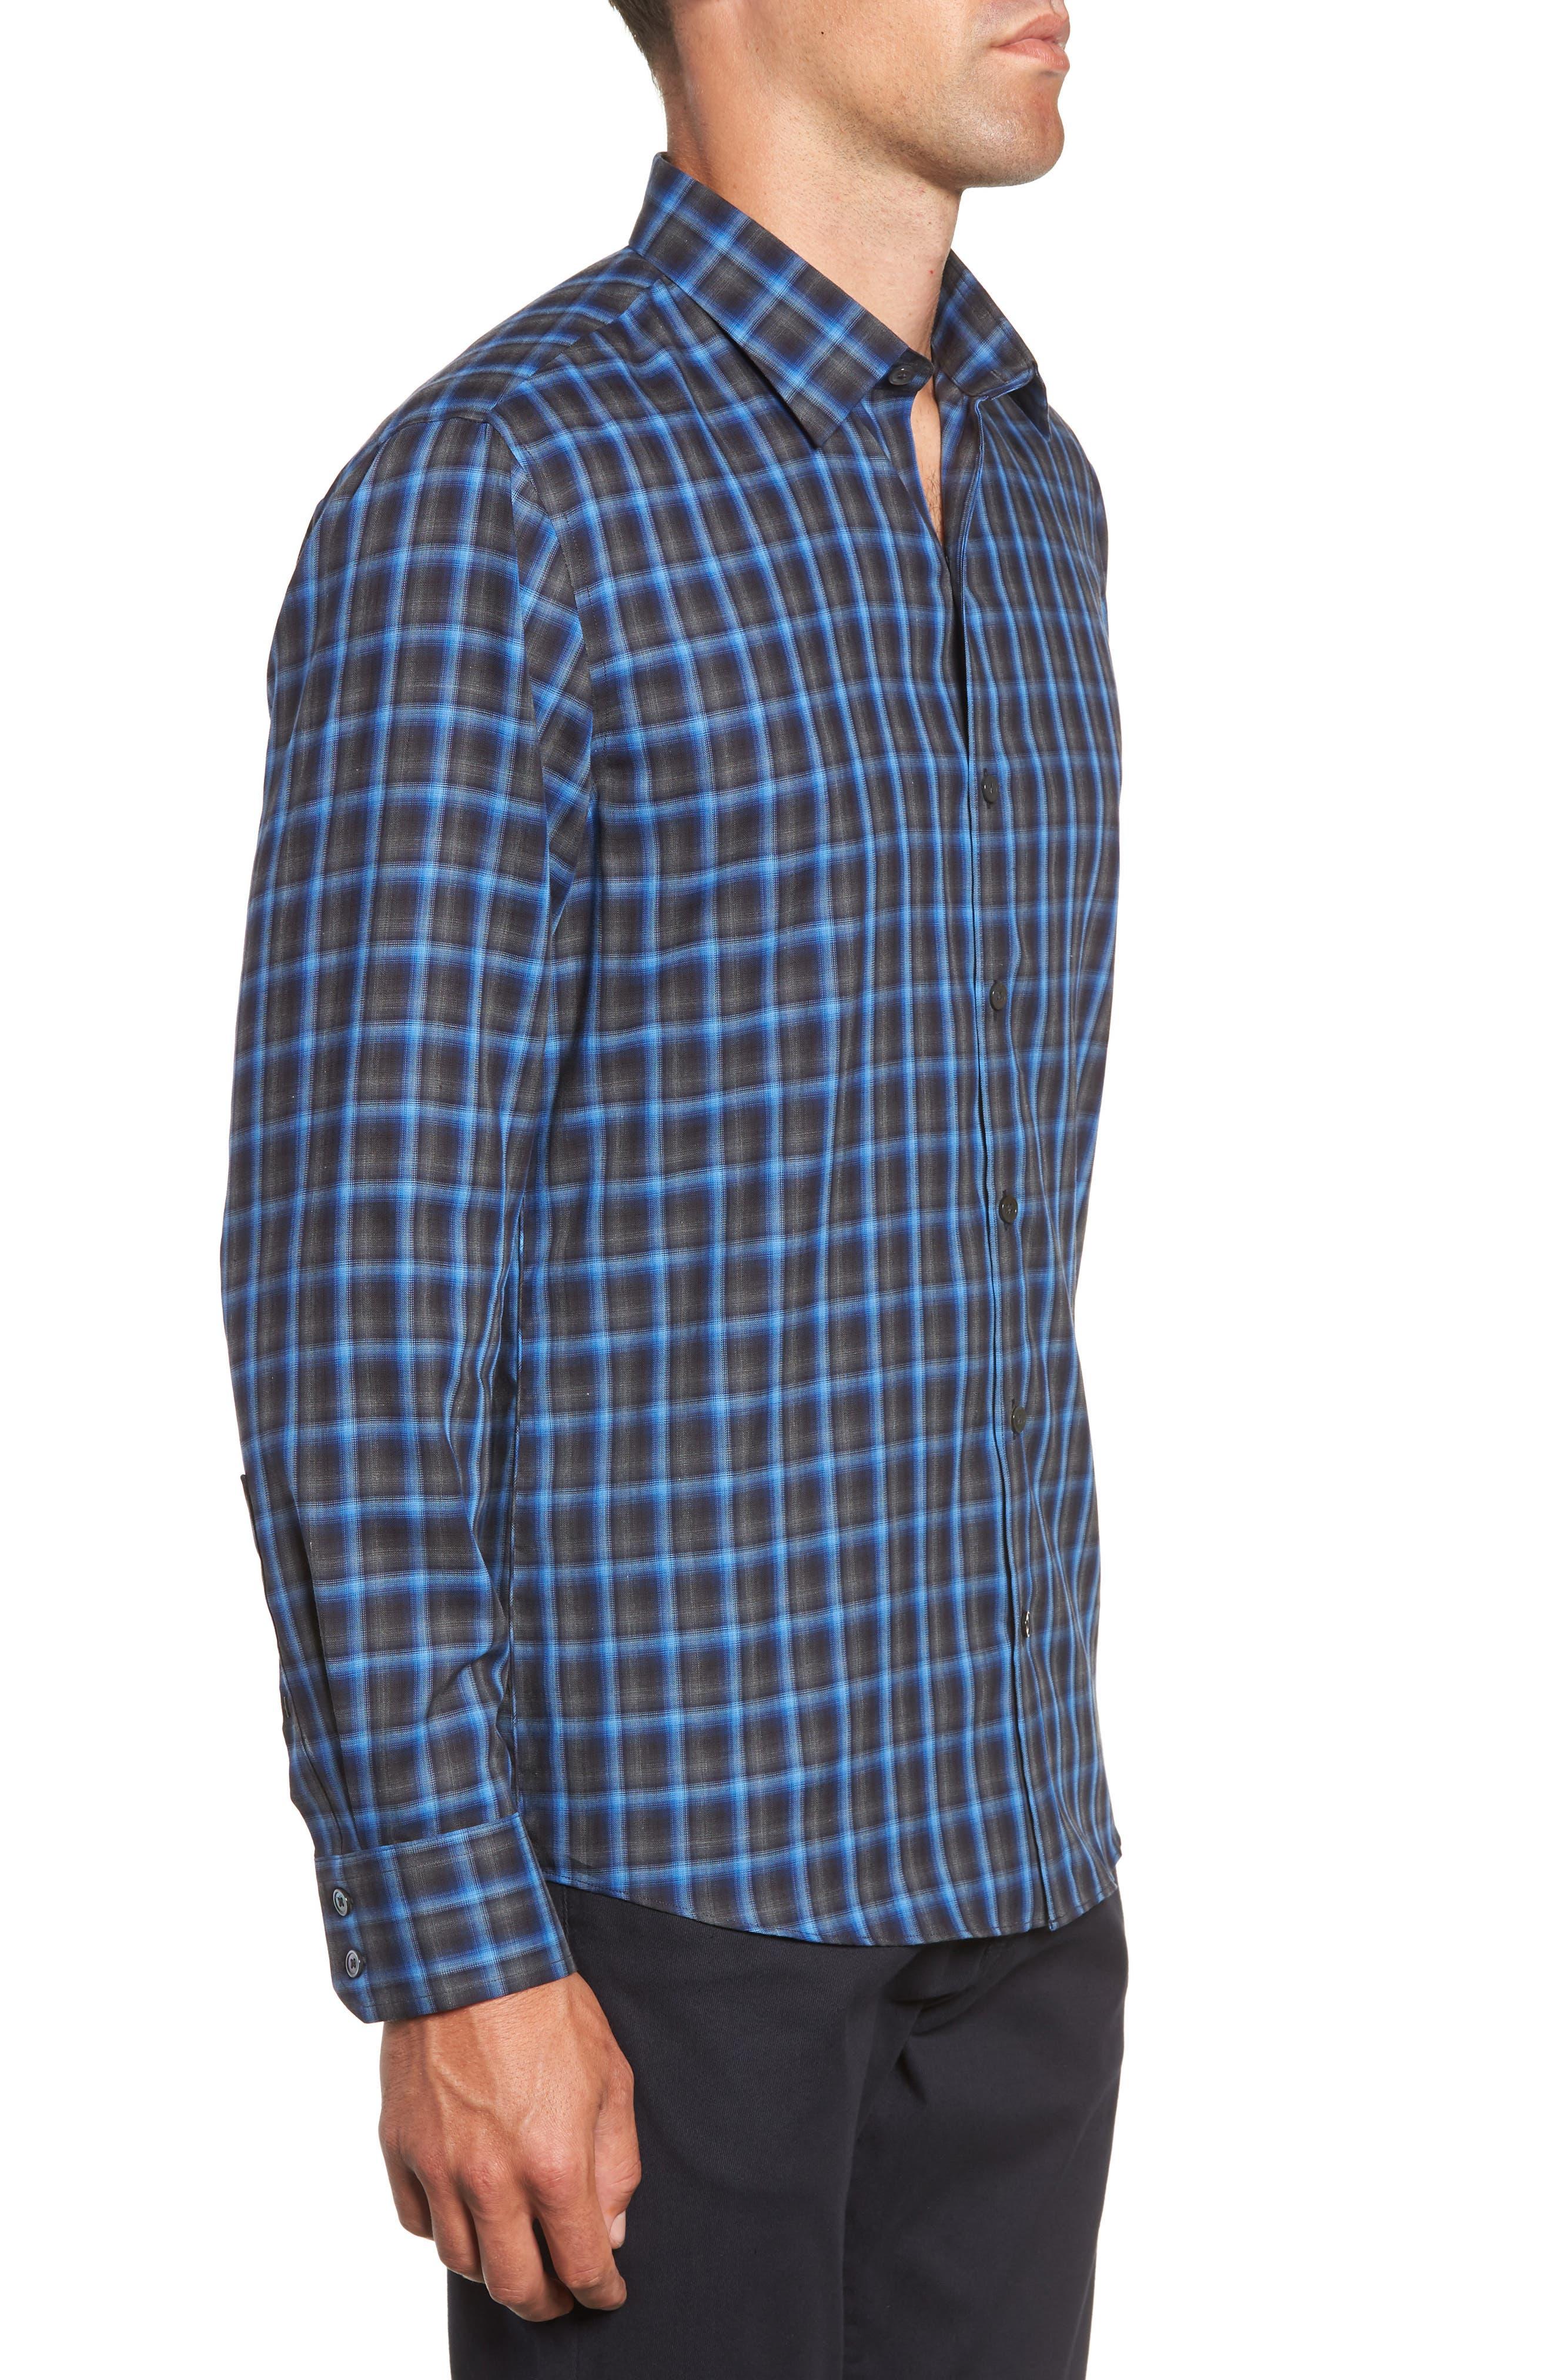 ZACHARY PRELL, Danise Regular Fit Check Sport Shirt, Alternate thumbnail 4, color, ROYAL BLUE